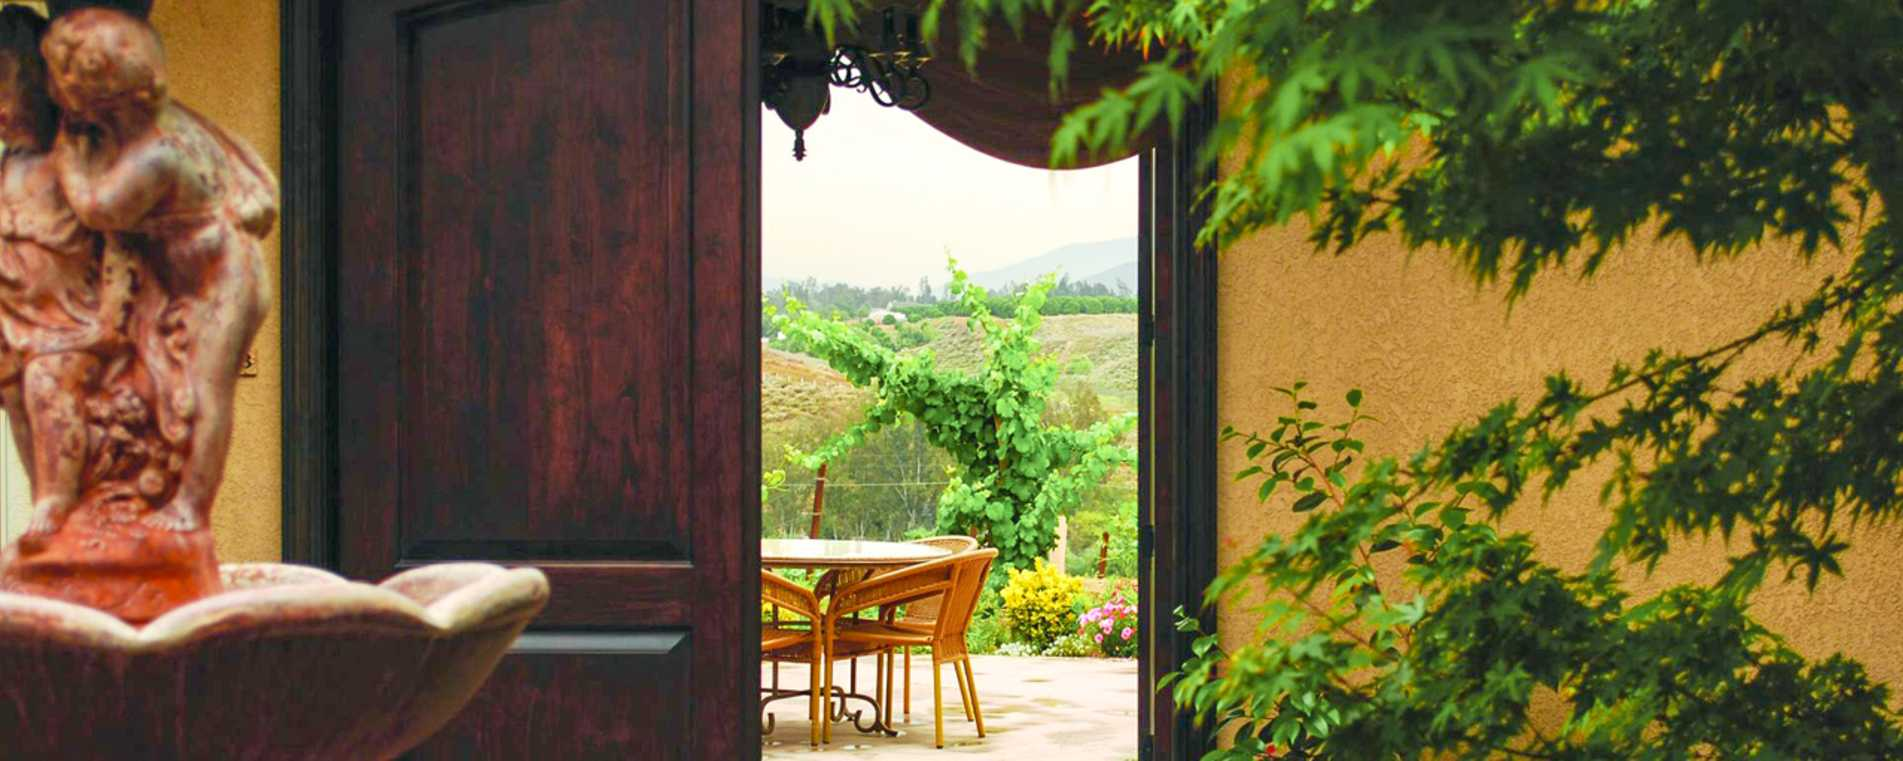 South Coast Winery Resort & Spa - Temecula